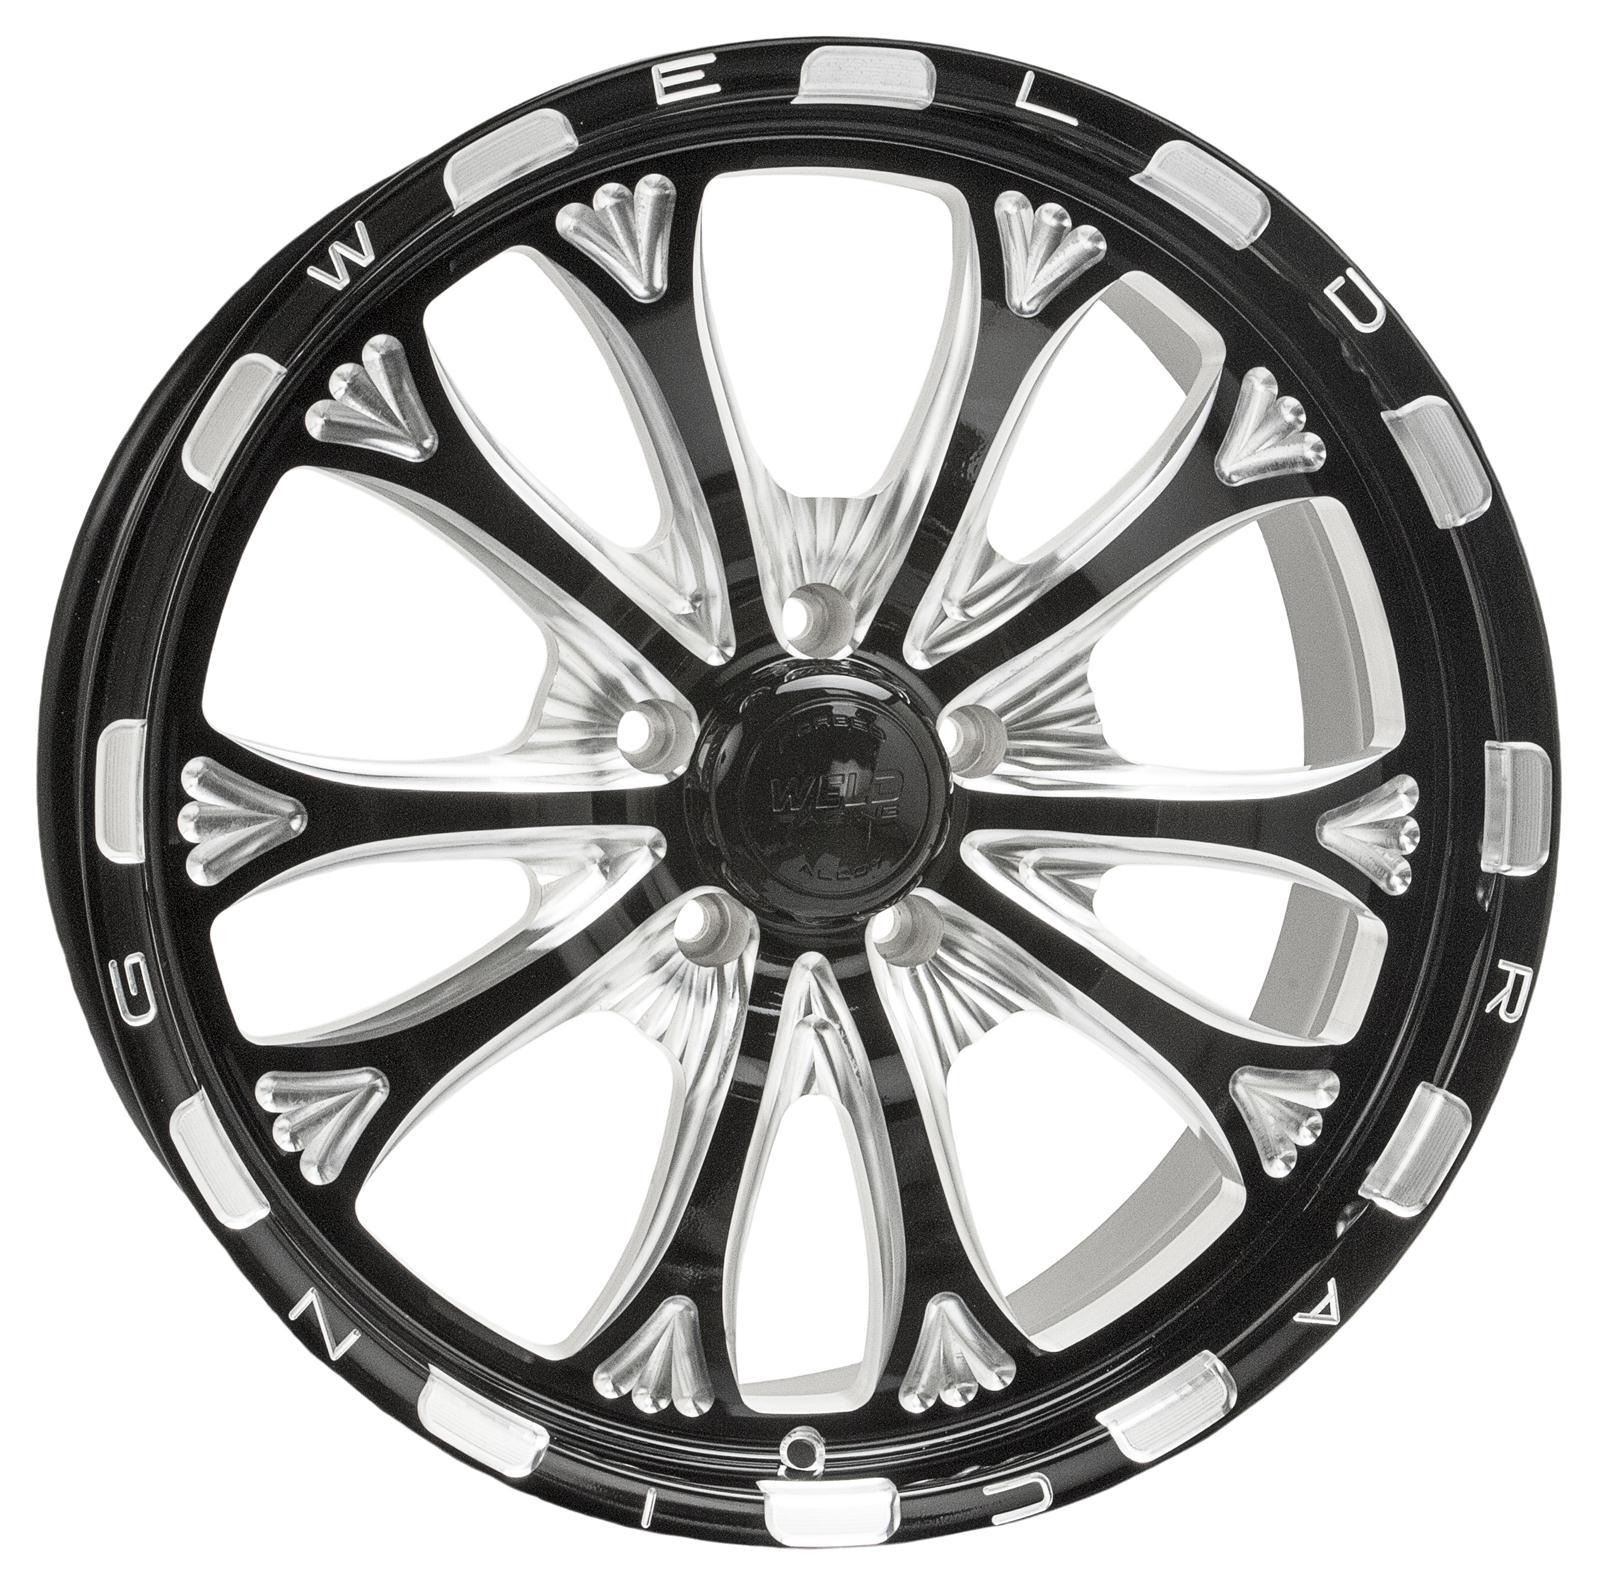 New 2015 ruff racing r362 wheels chrome pvd ruff racing wheels